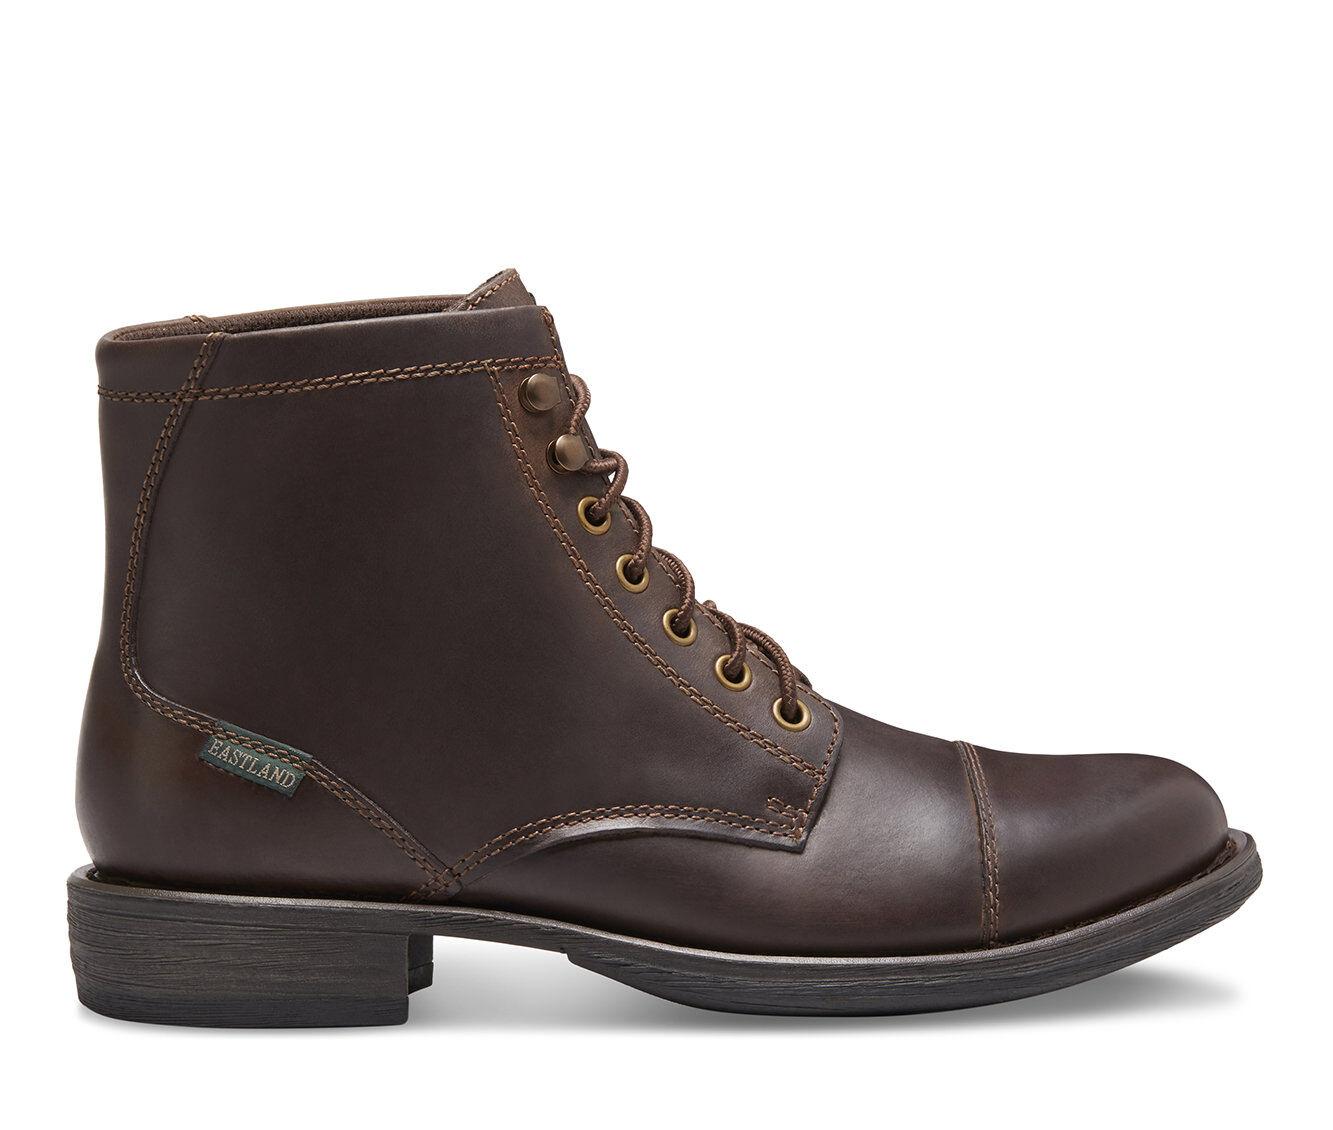 Men's Eastland High Fidelity Boots Dark Brown